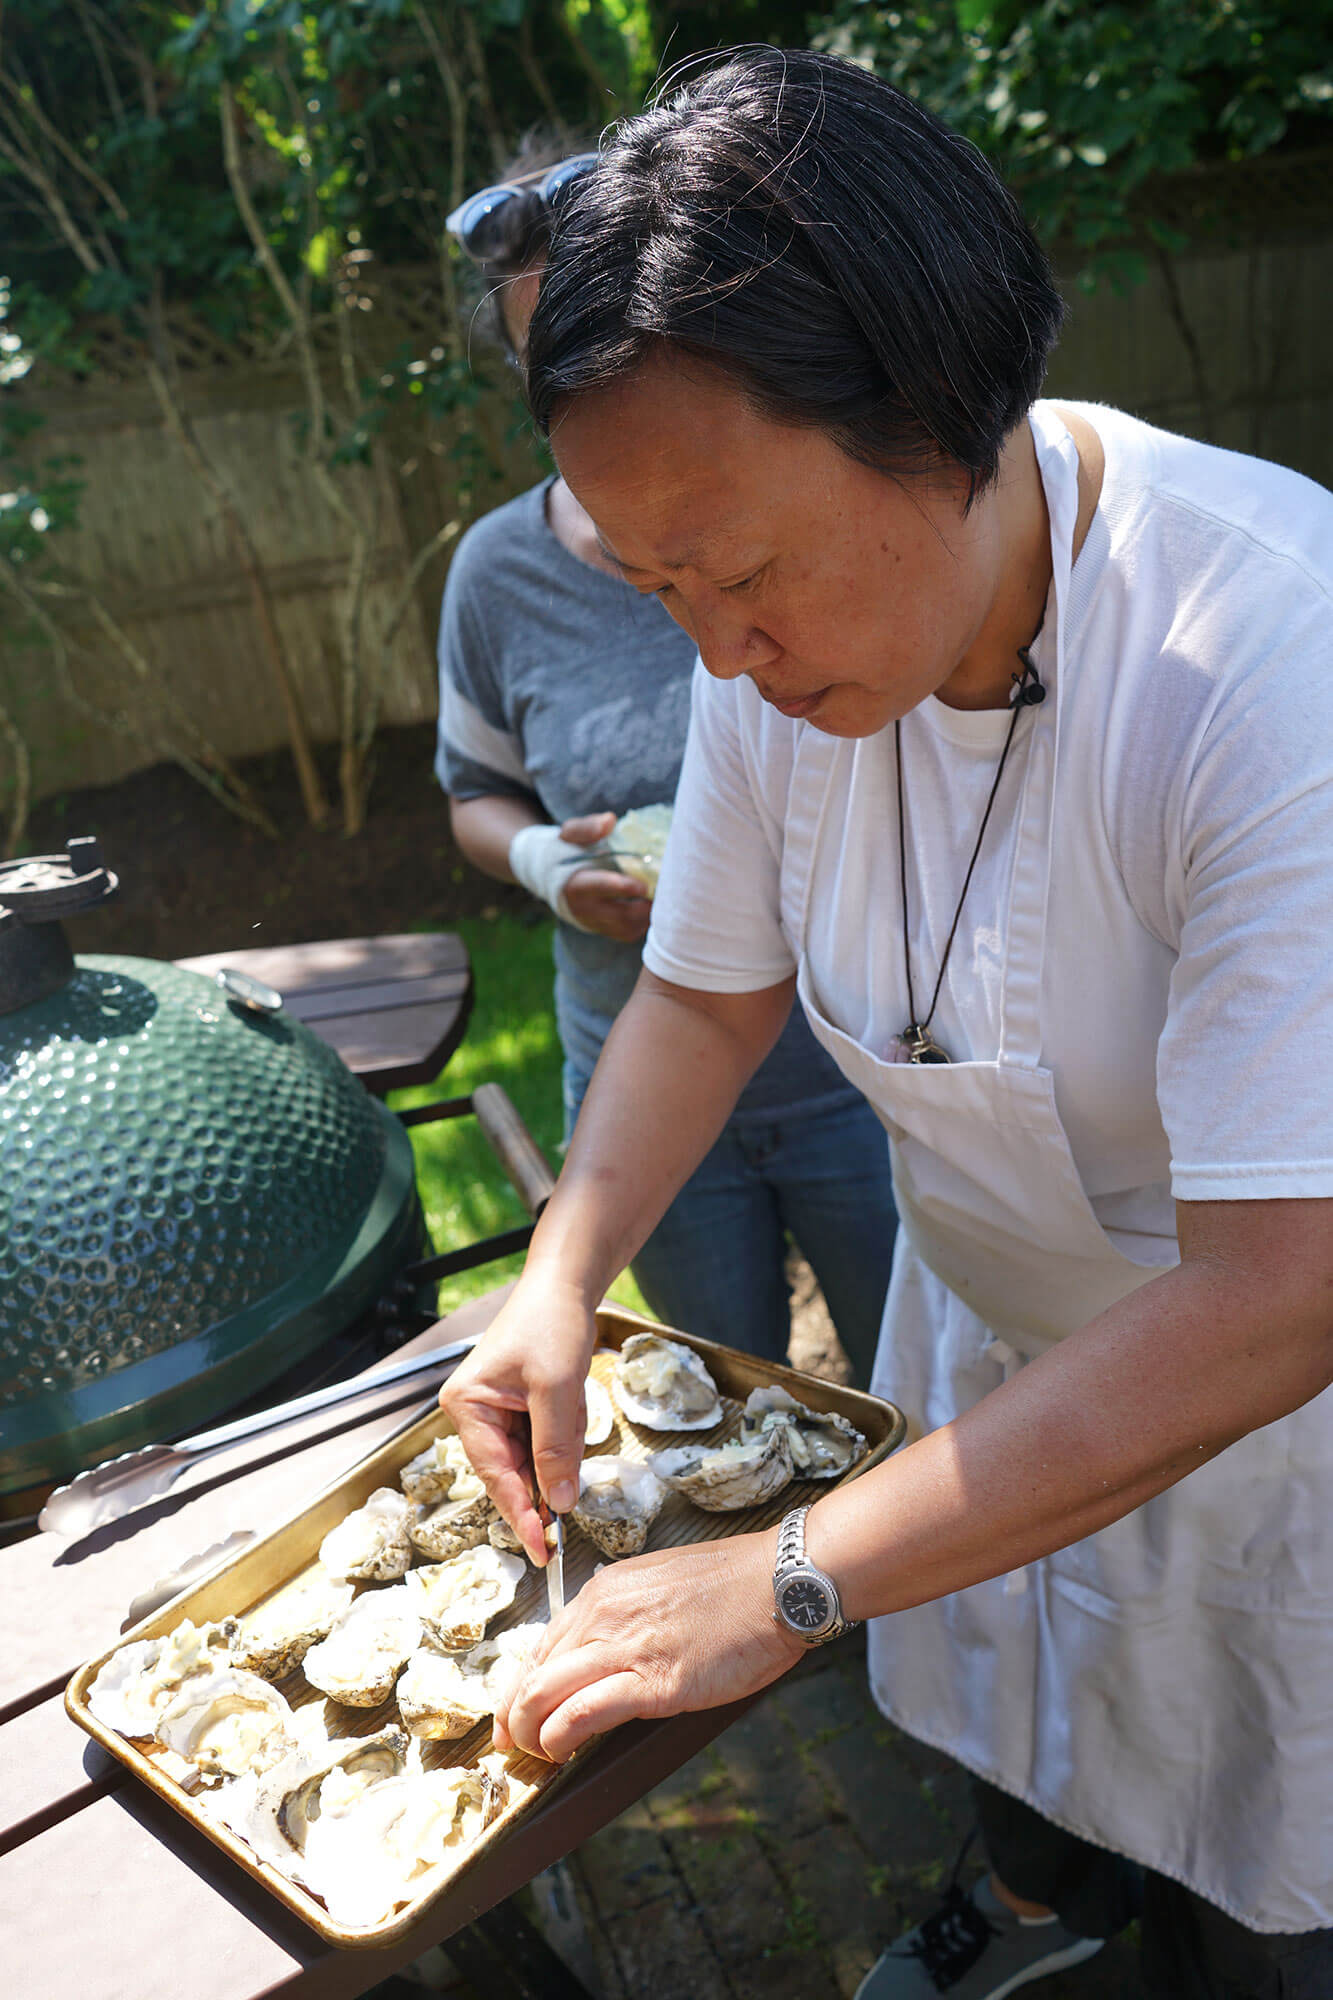 Anita preparing Oysters